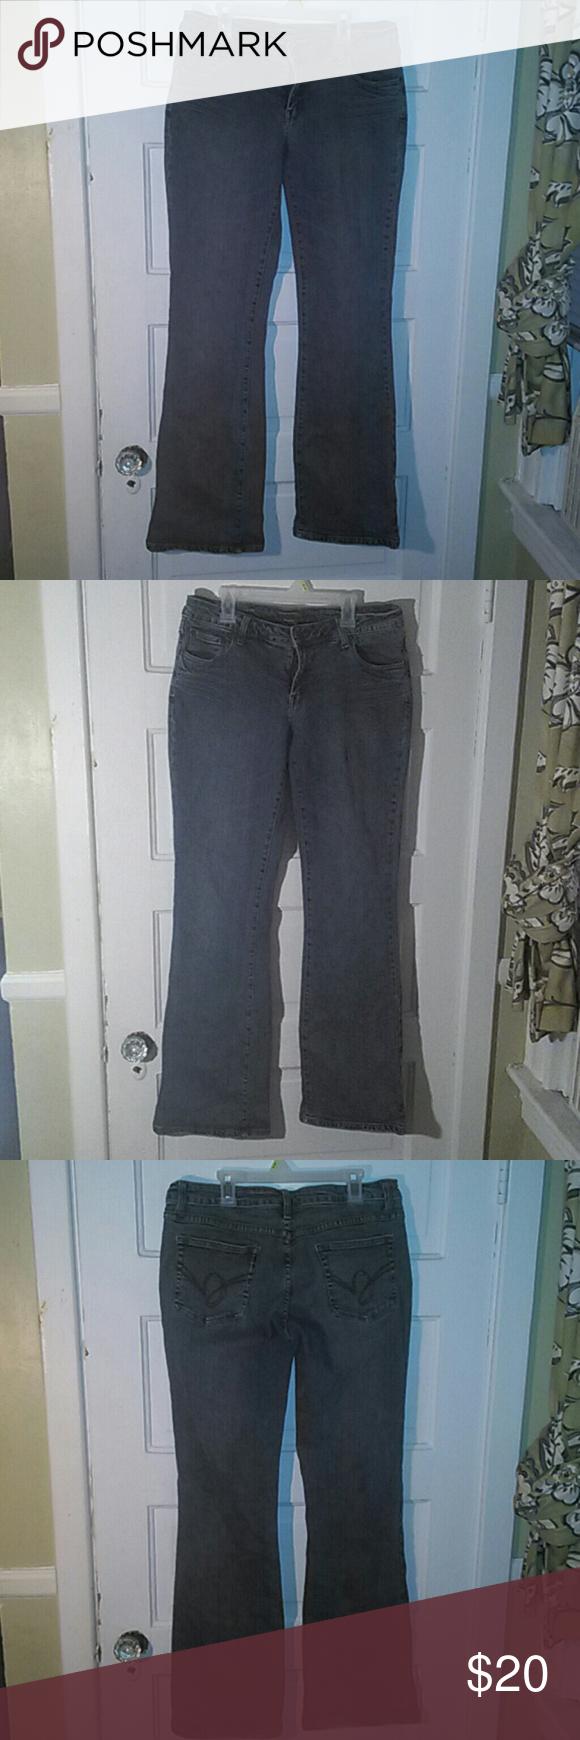 Rue 21 blue  denim women's jeans Rue 21 blue denim women's jeans Rue 21 Jeans Boot Cut